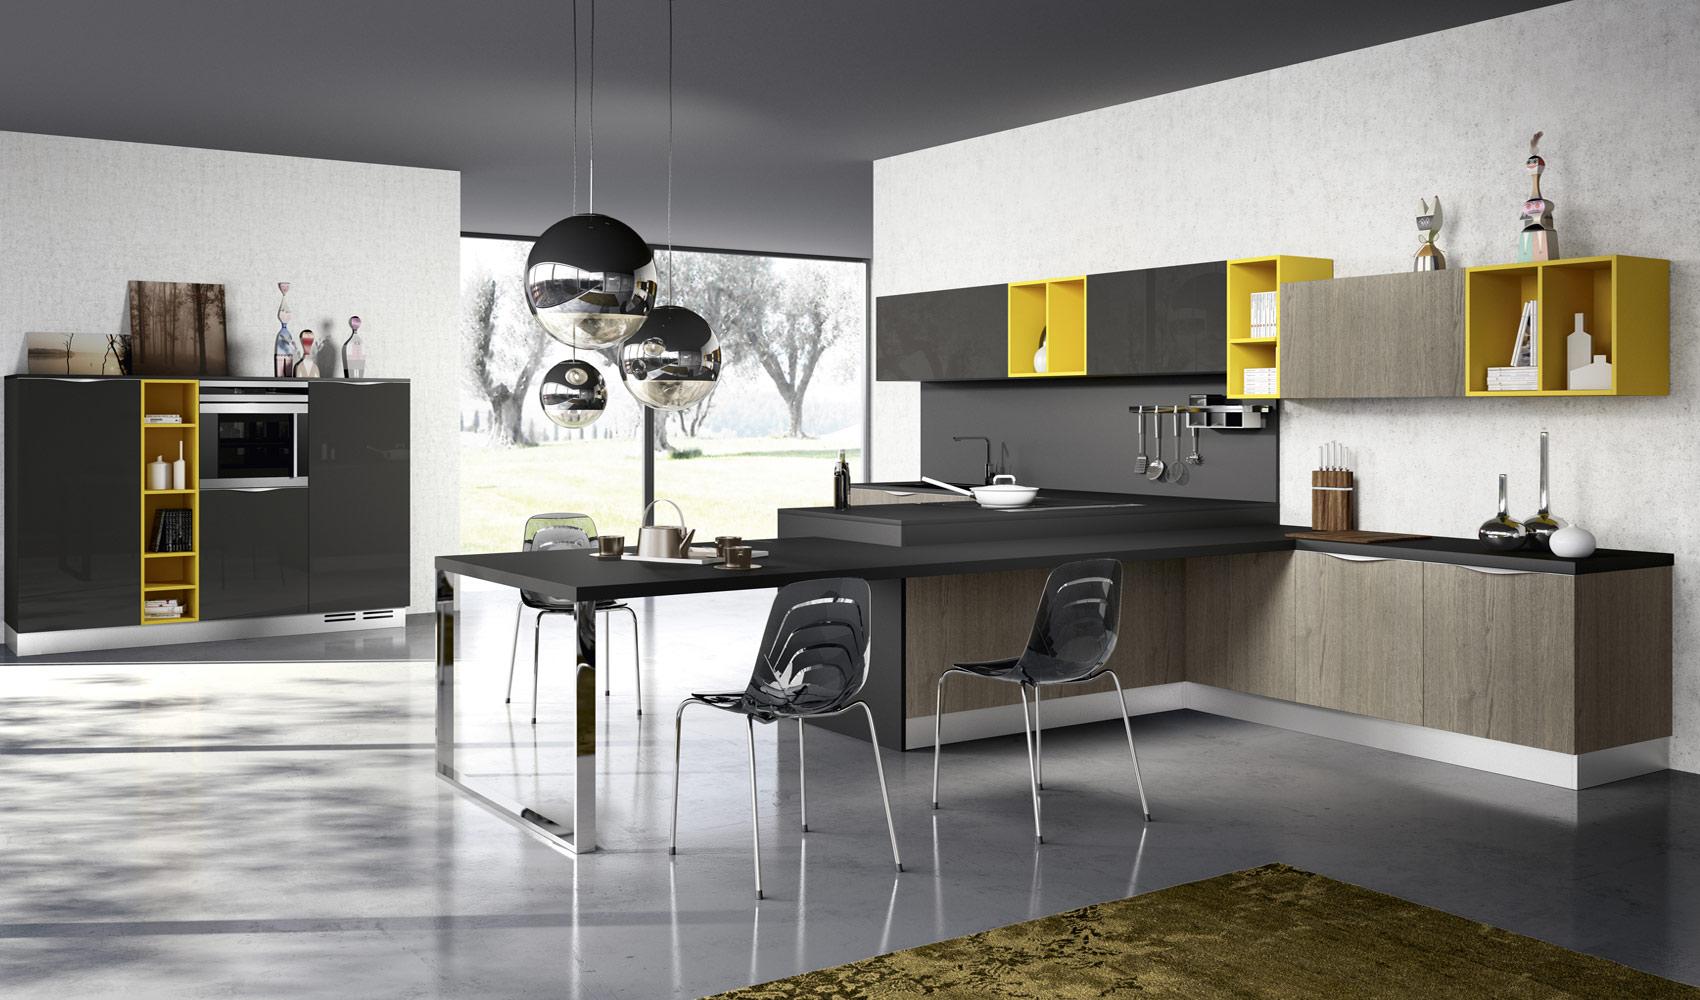 Deco] Tendencia en cocinas ¡a todo color! – Virlova Style